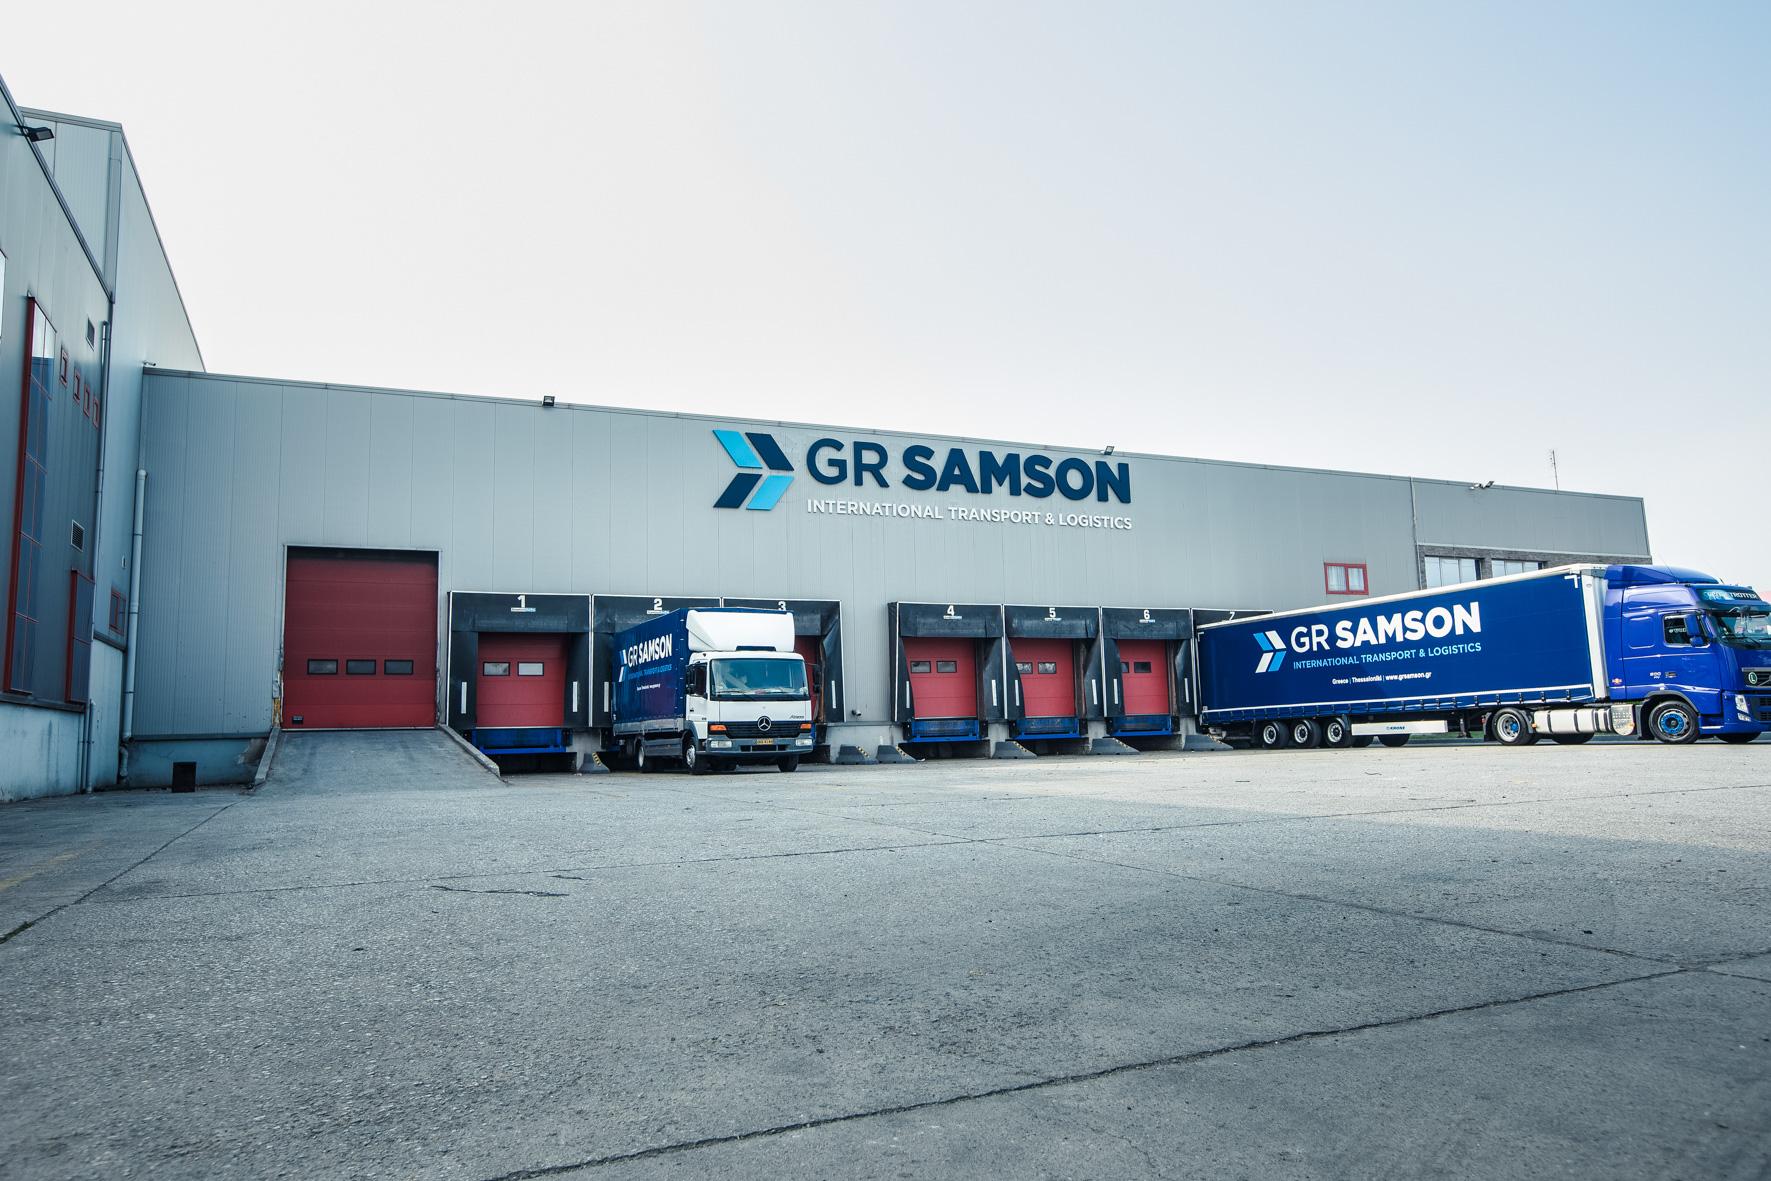 GR-Samson